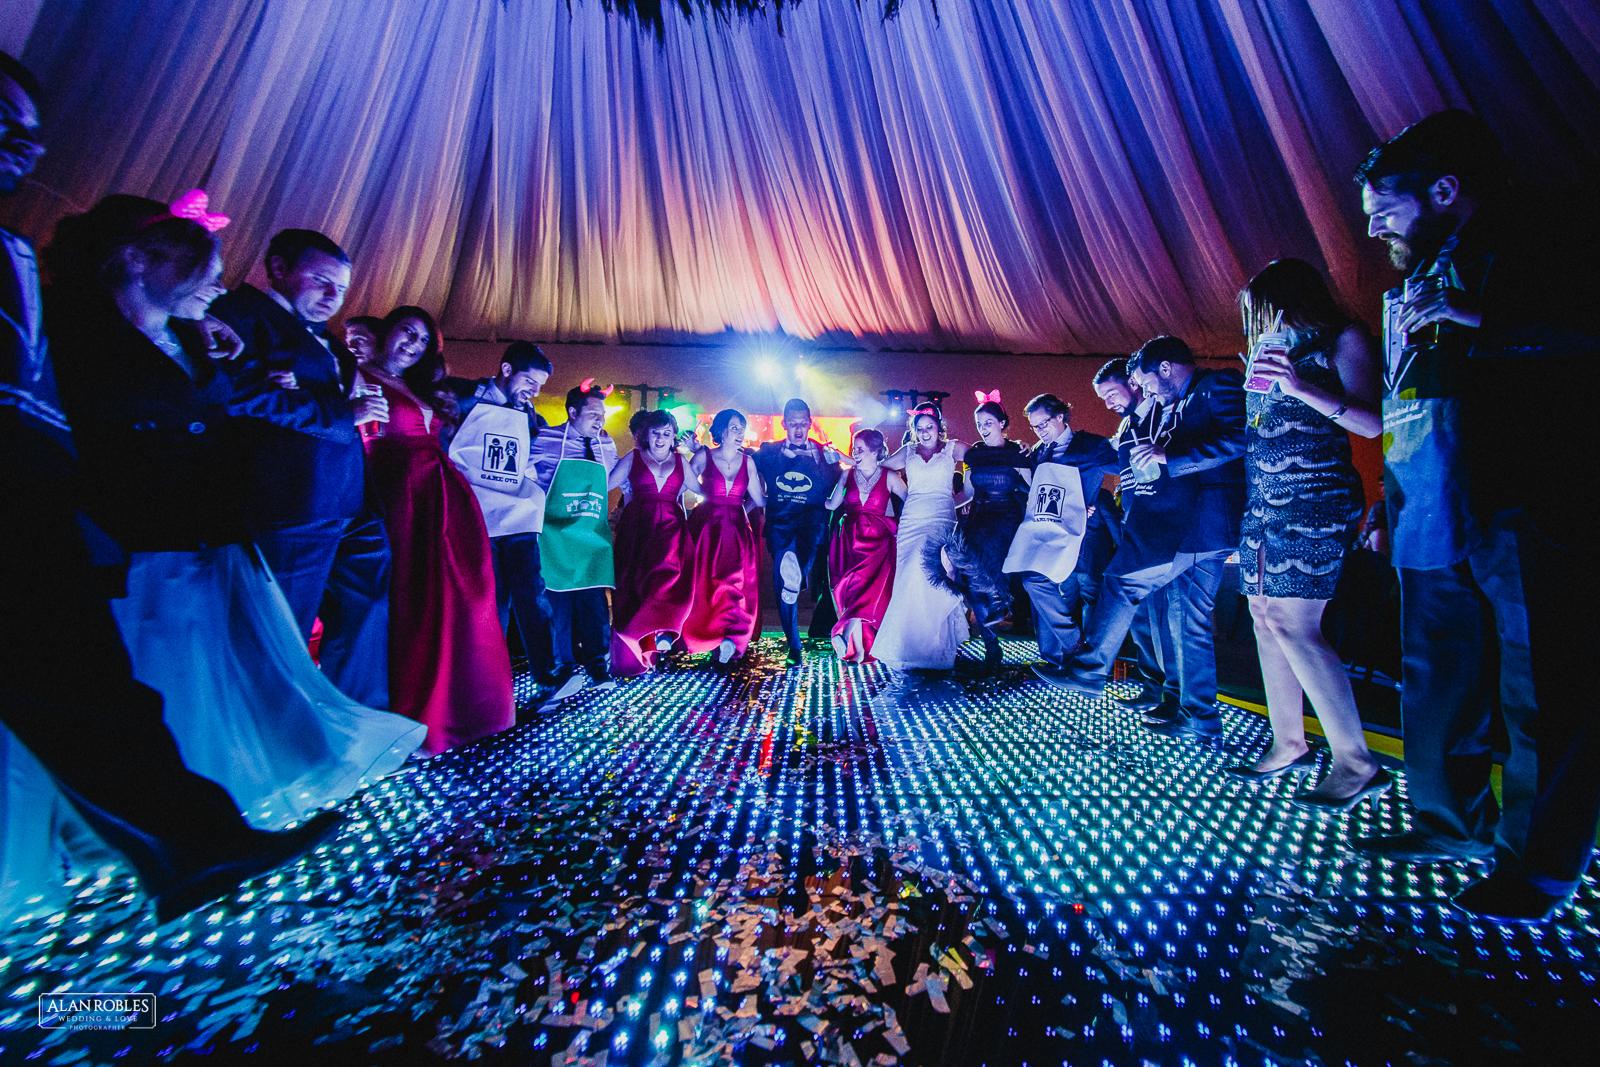 Fotografo de bodas Alan Robles-Boda en Guadalajara Real San Javier-64